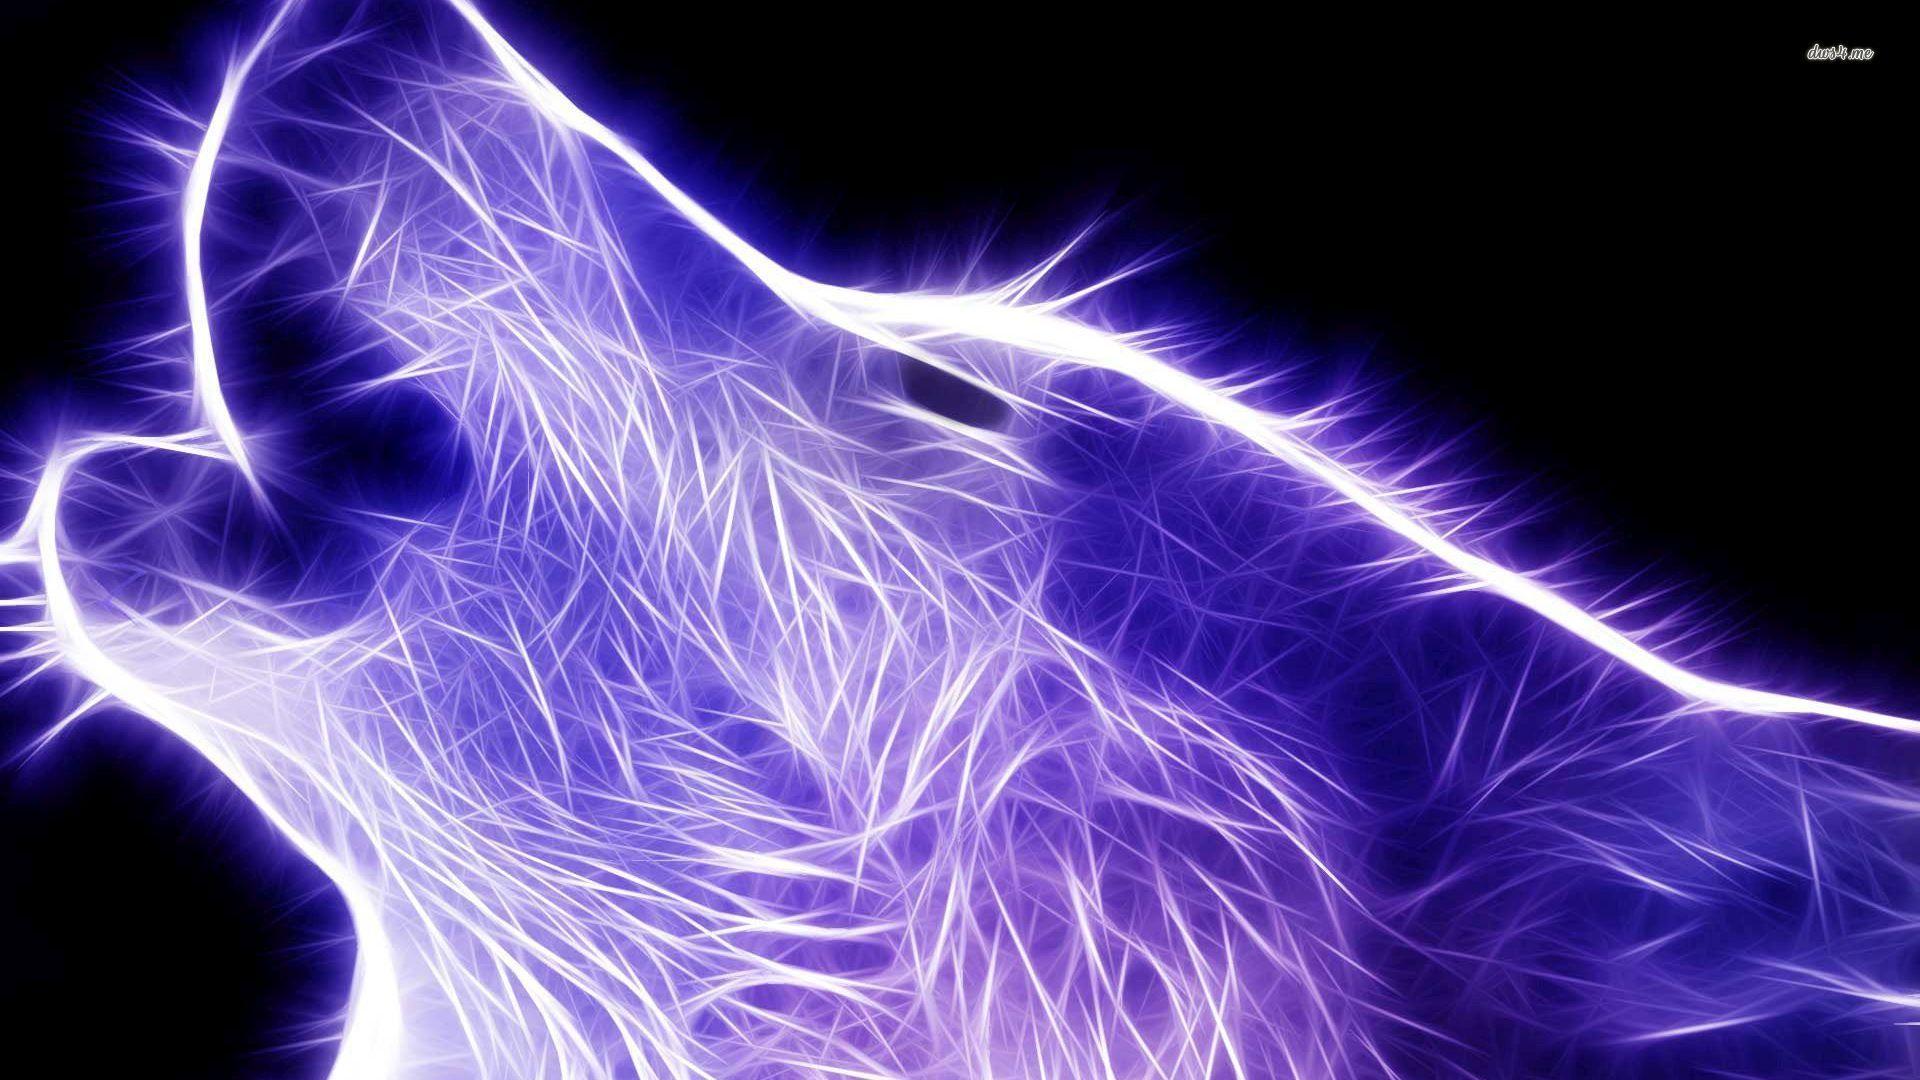 lightanimals Animal Wallpaper Light cool animal hd